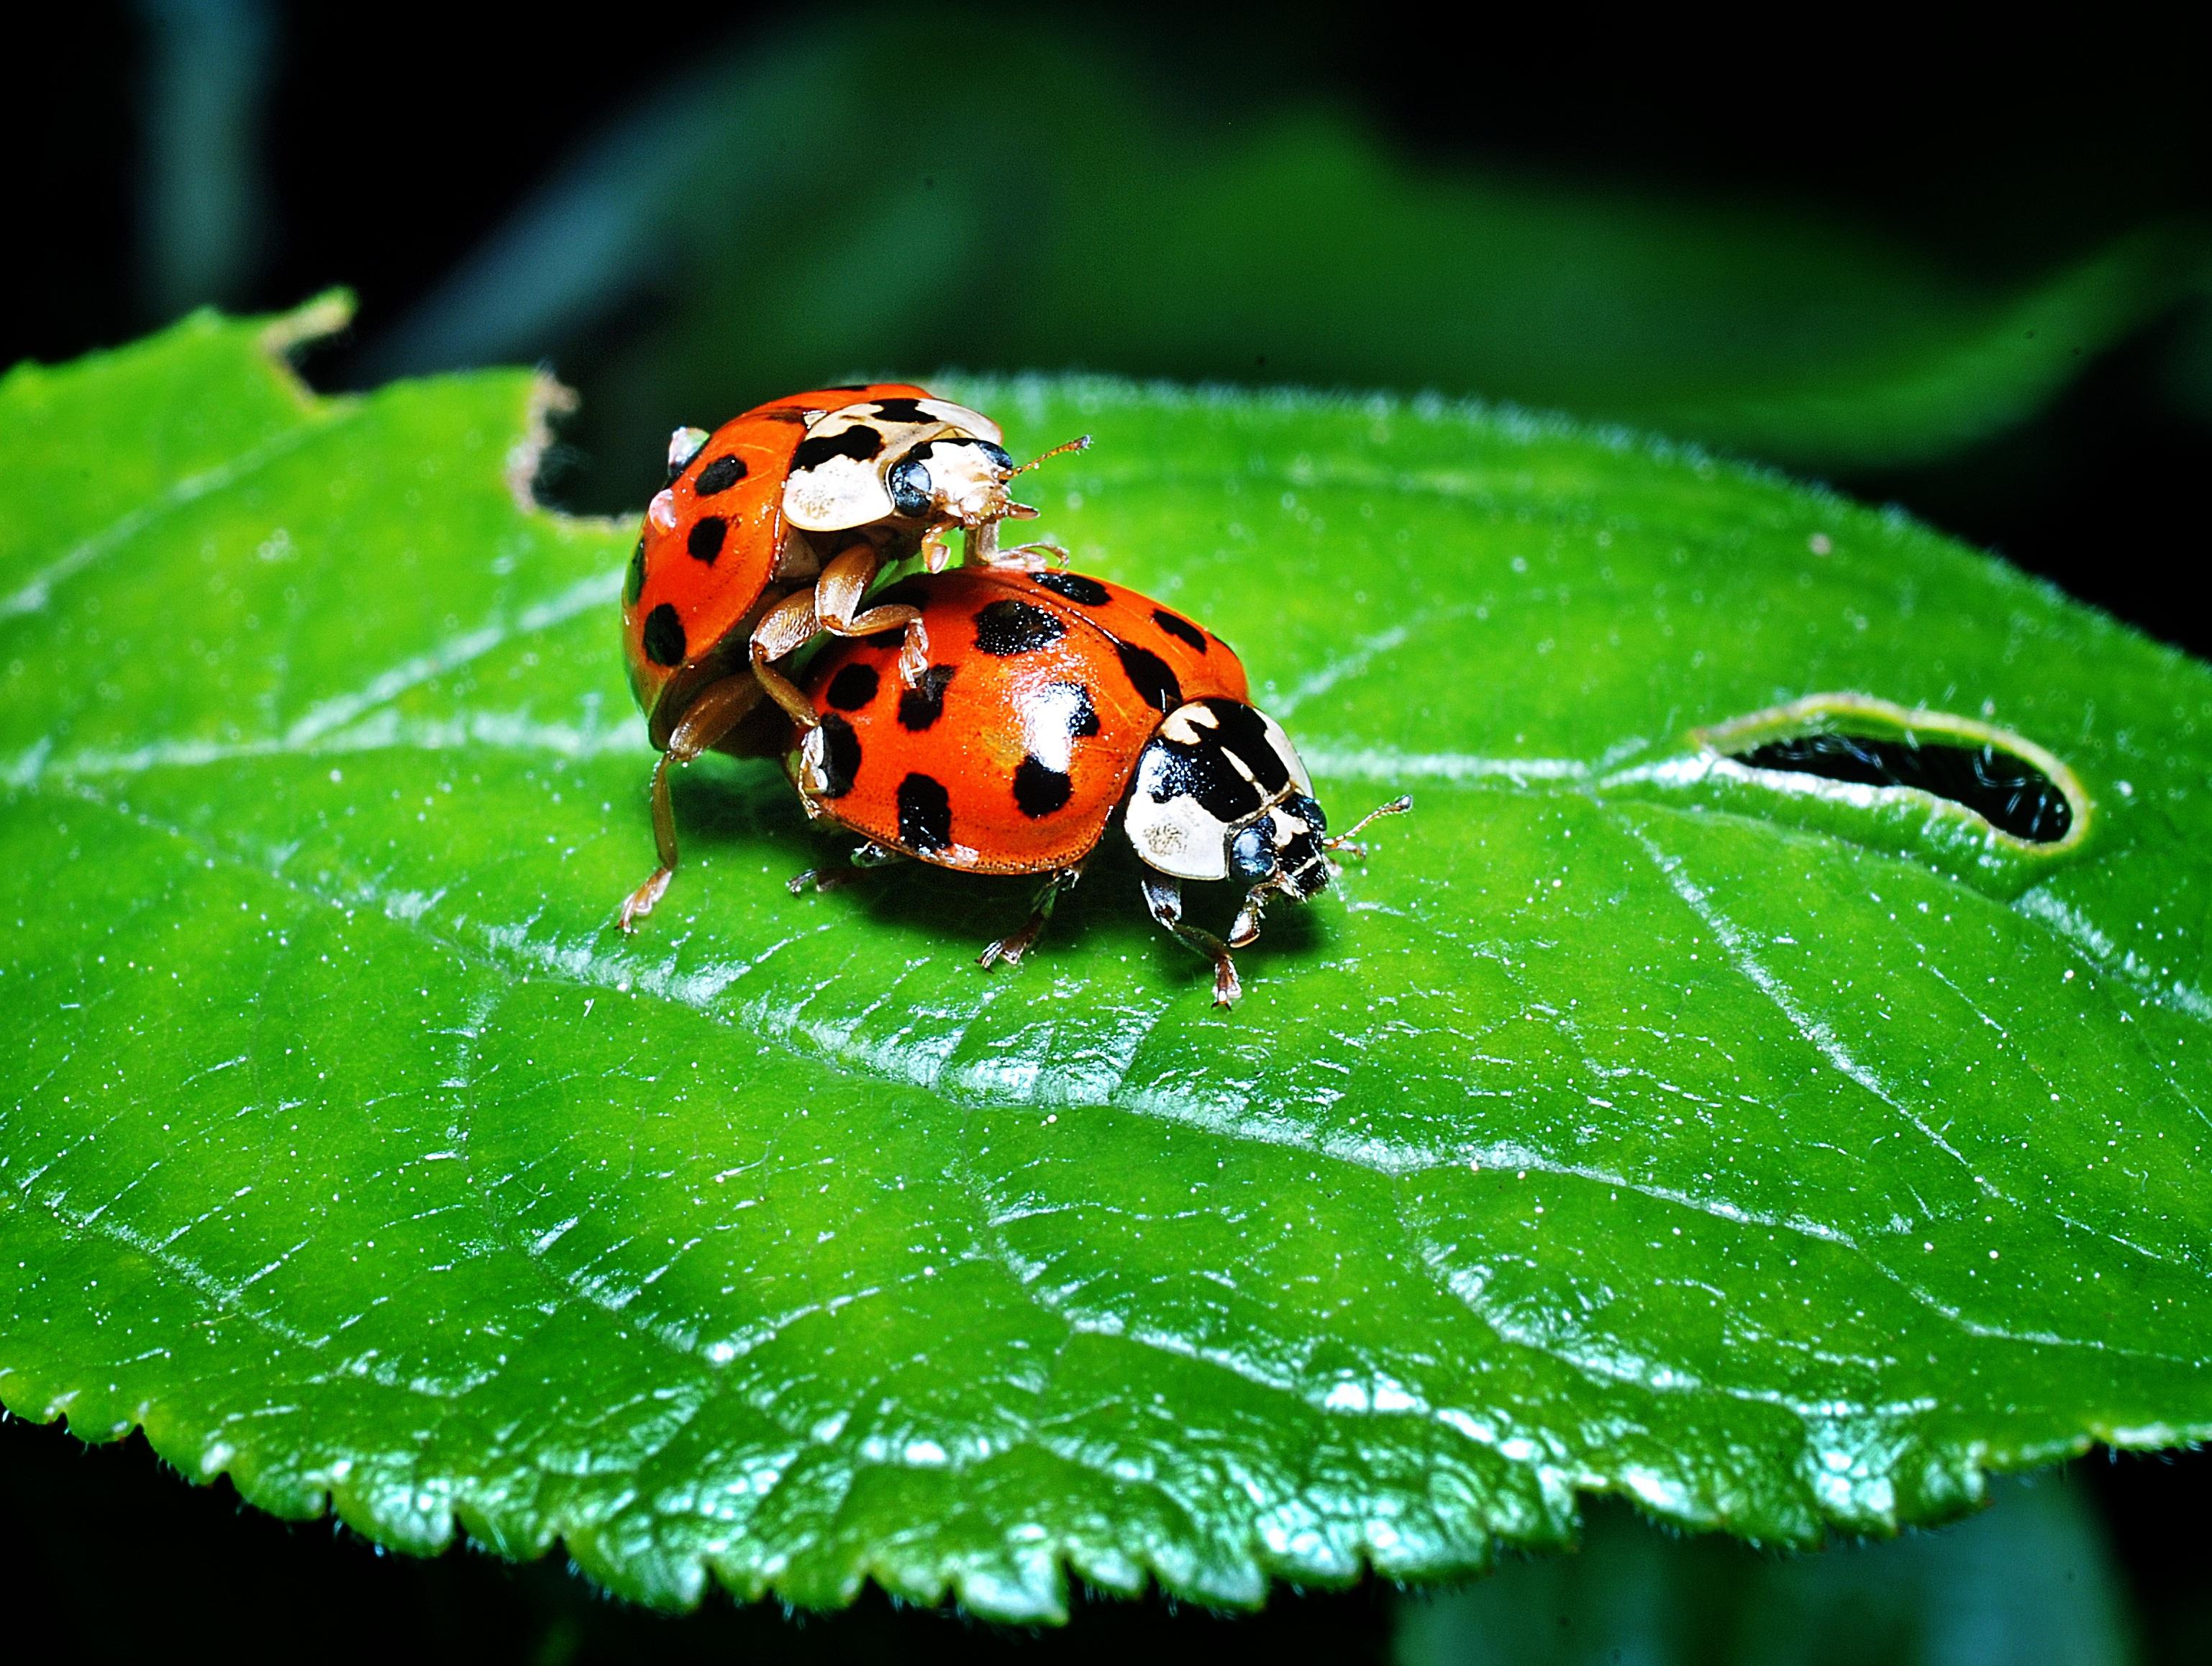 Free Images  Nature, Flower, Green, Insect, Botany, Garden, Closeup, Fauna, Ladybird -9401